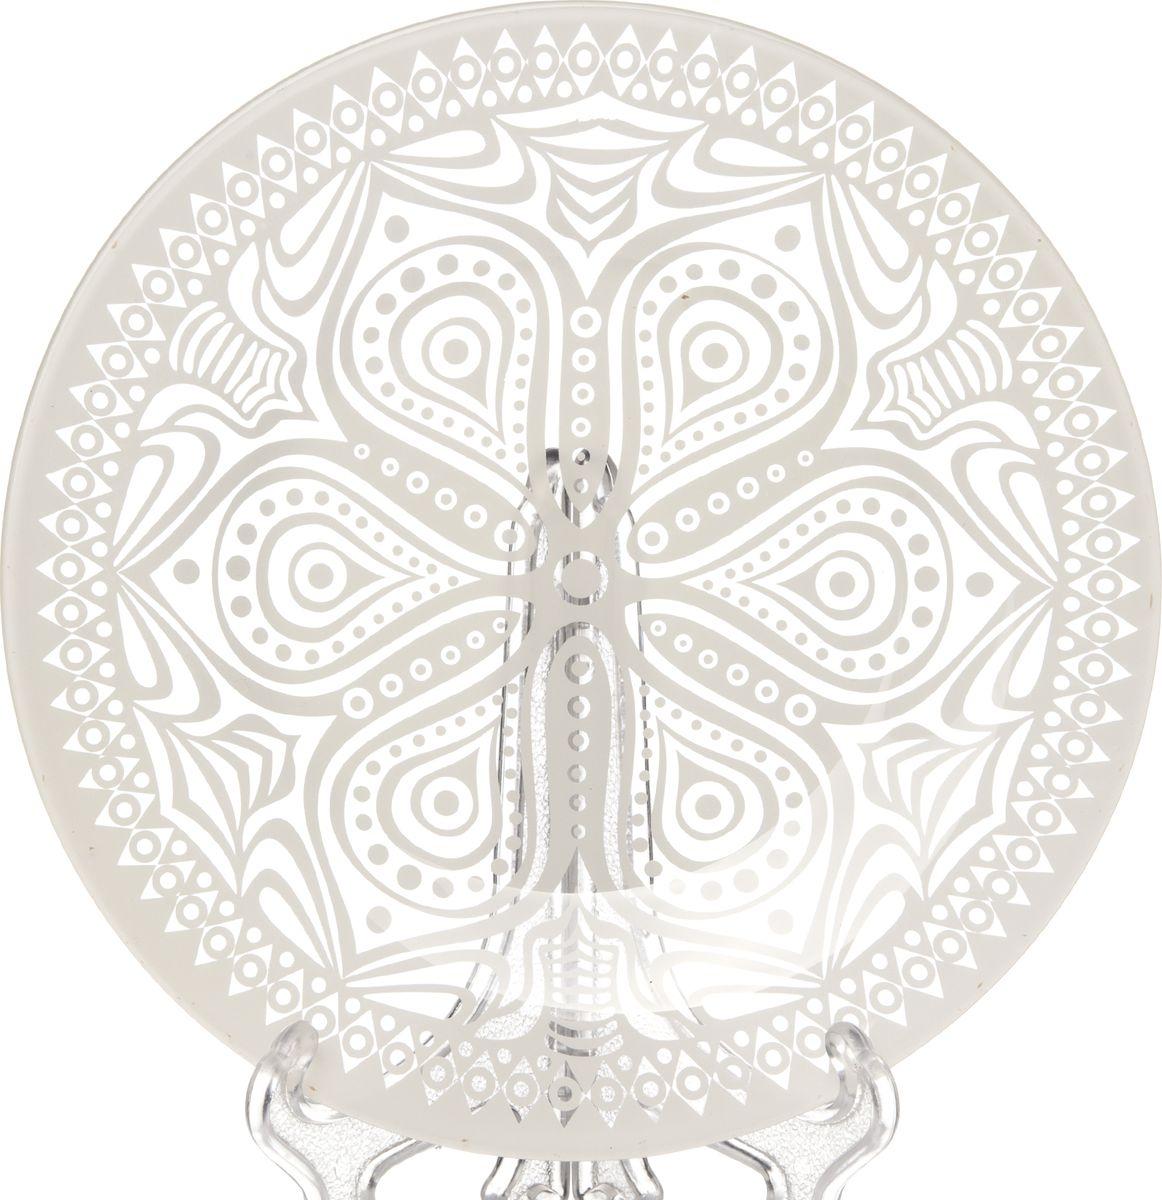 Тарелка Pasabahce Бохо, цвет: бежевый, диаметр 19,5 см pasabahce